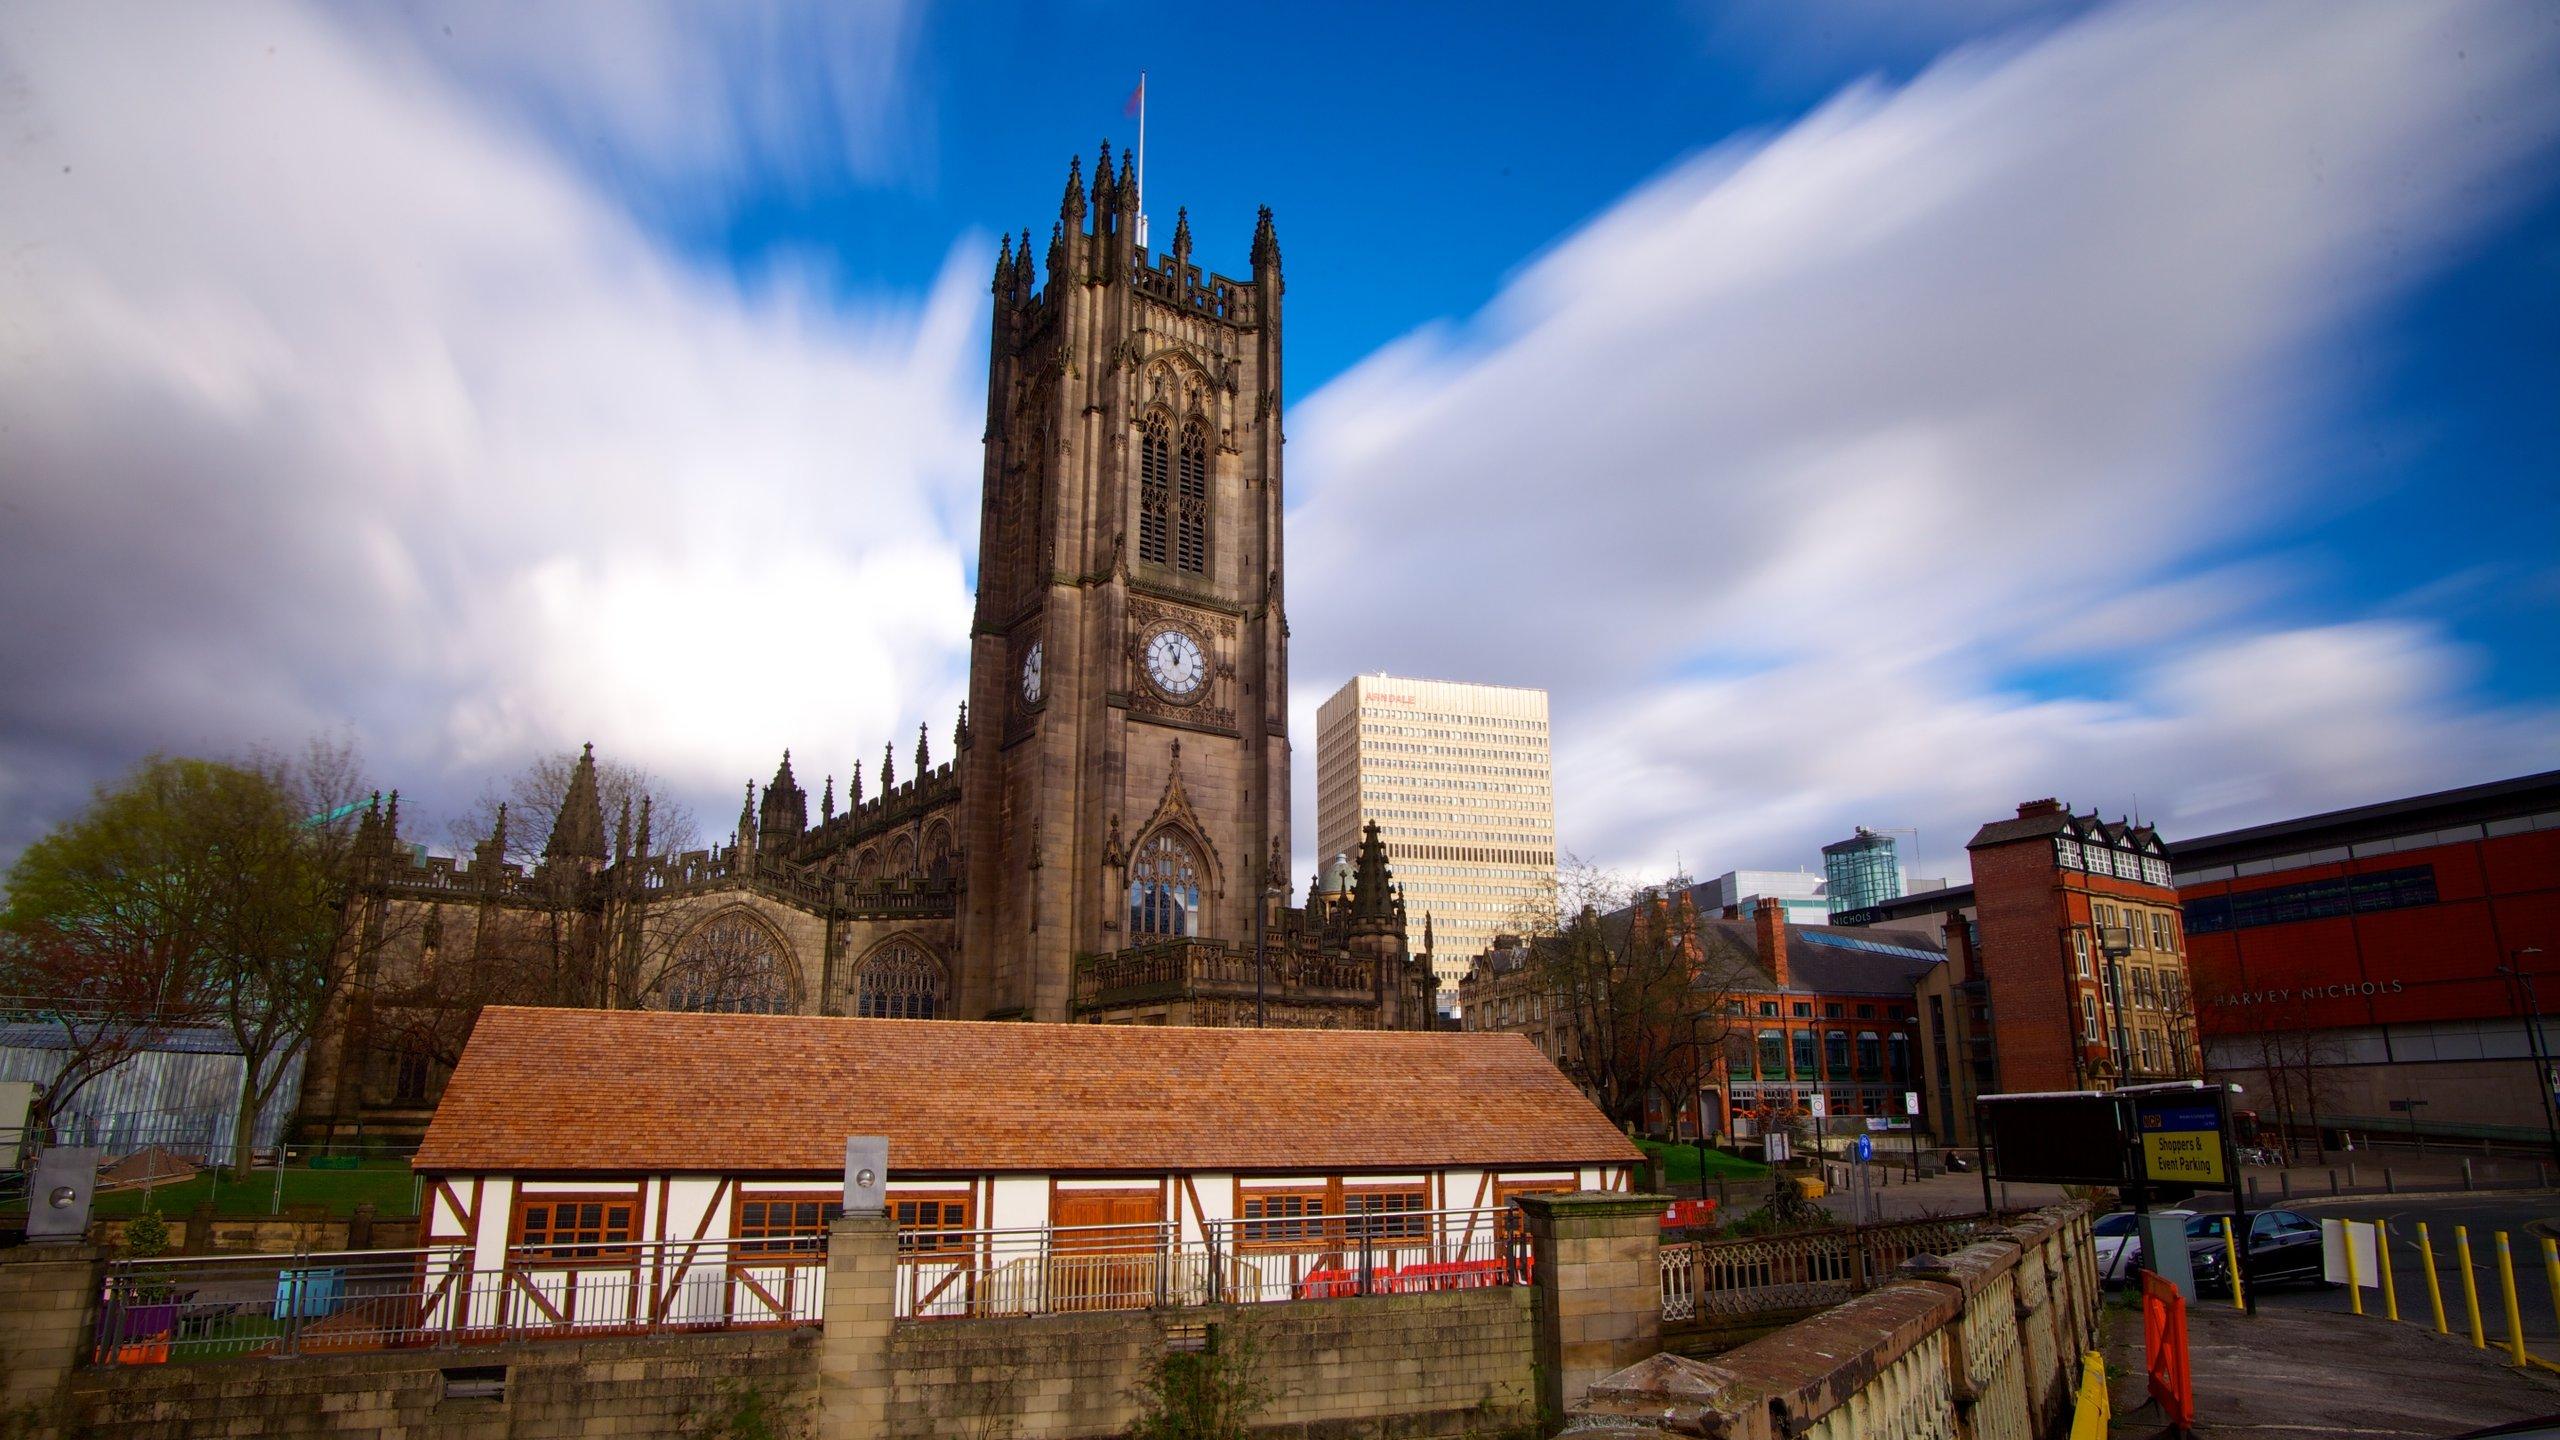 Manchester Kathedrale, Manchester, England, Großbritannien